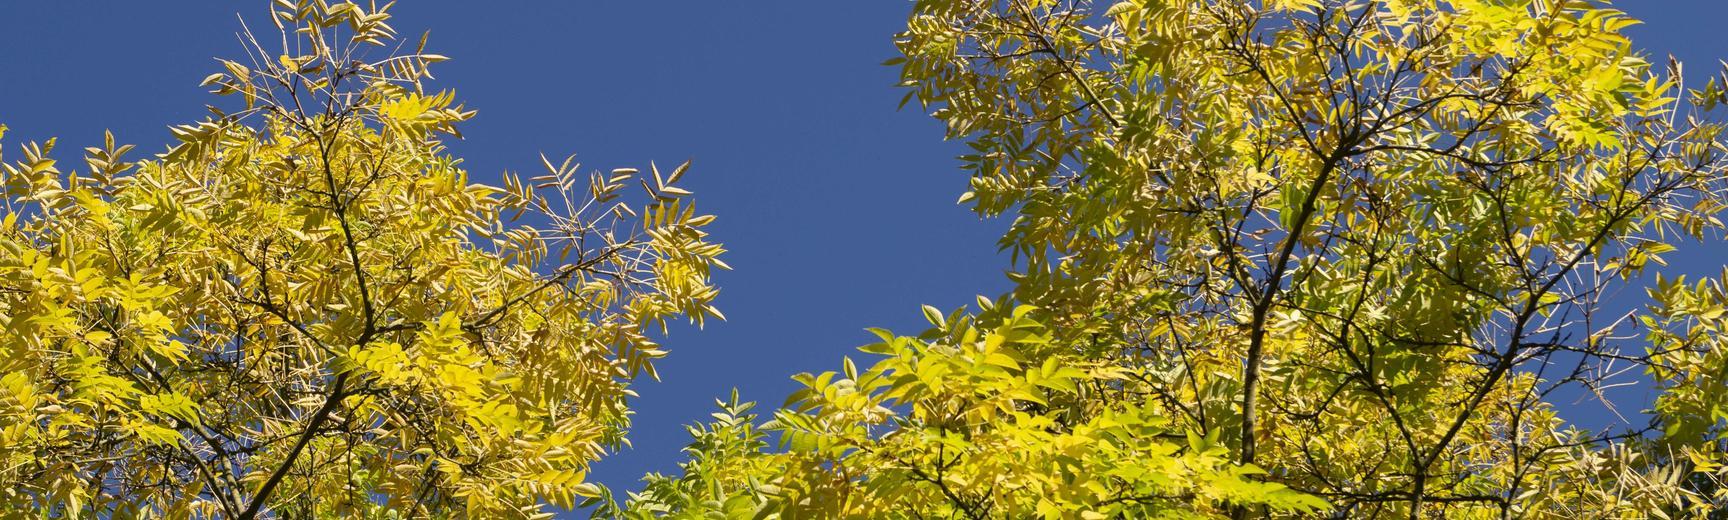 phellodendron amurense  arboretum  autumn